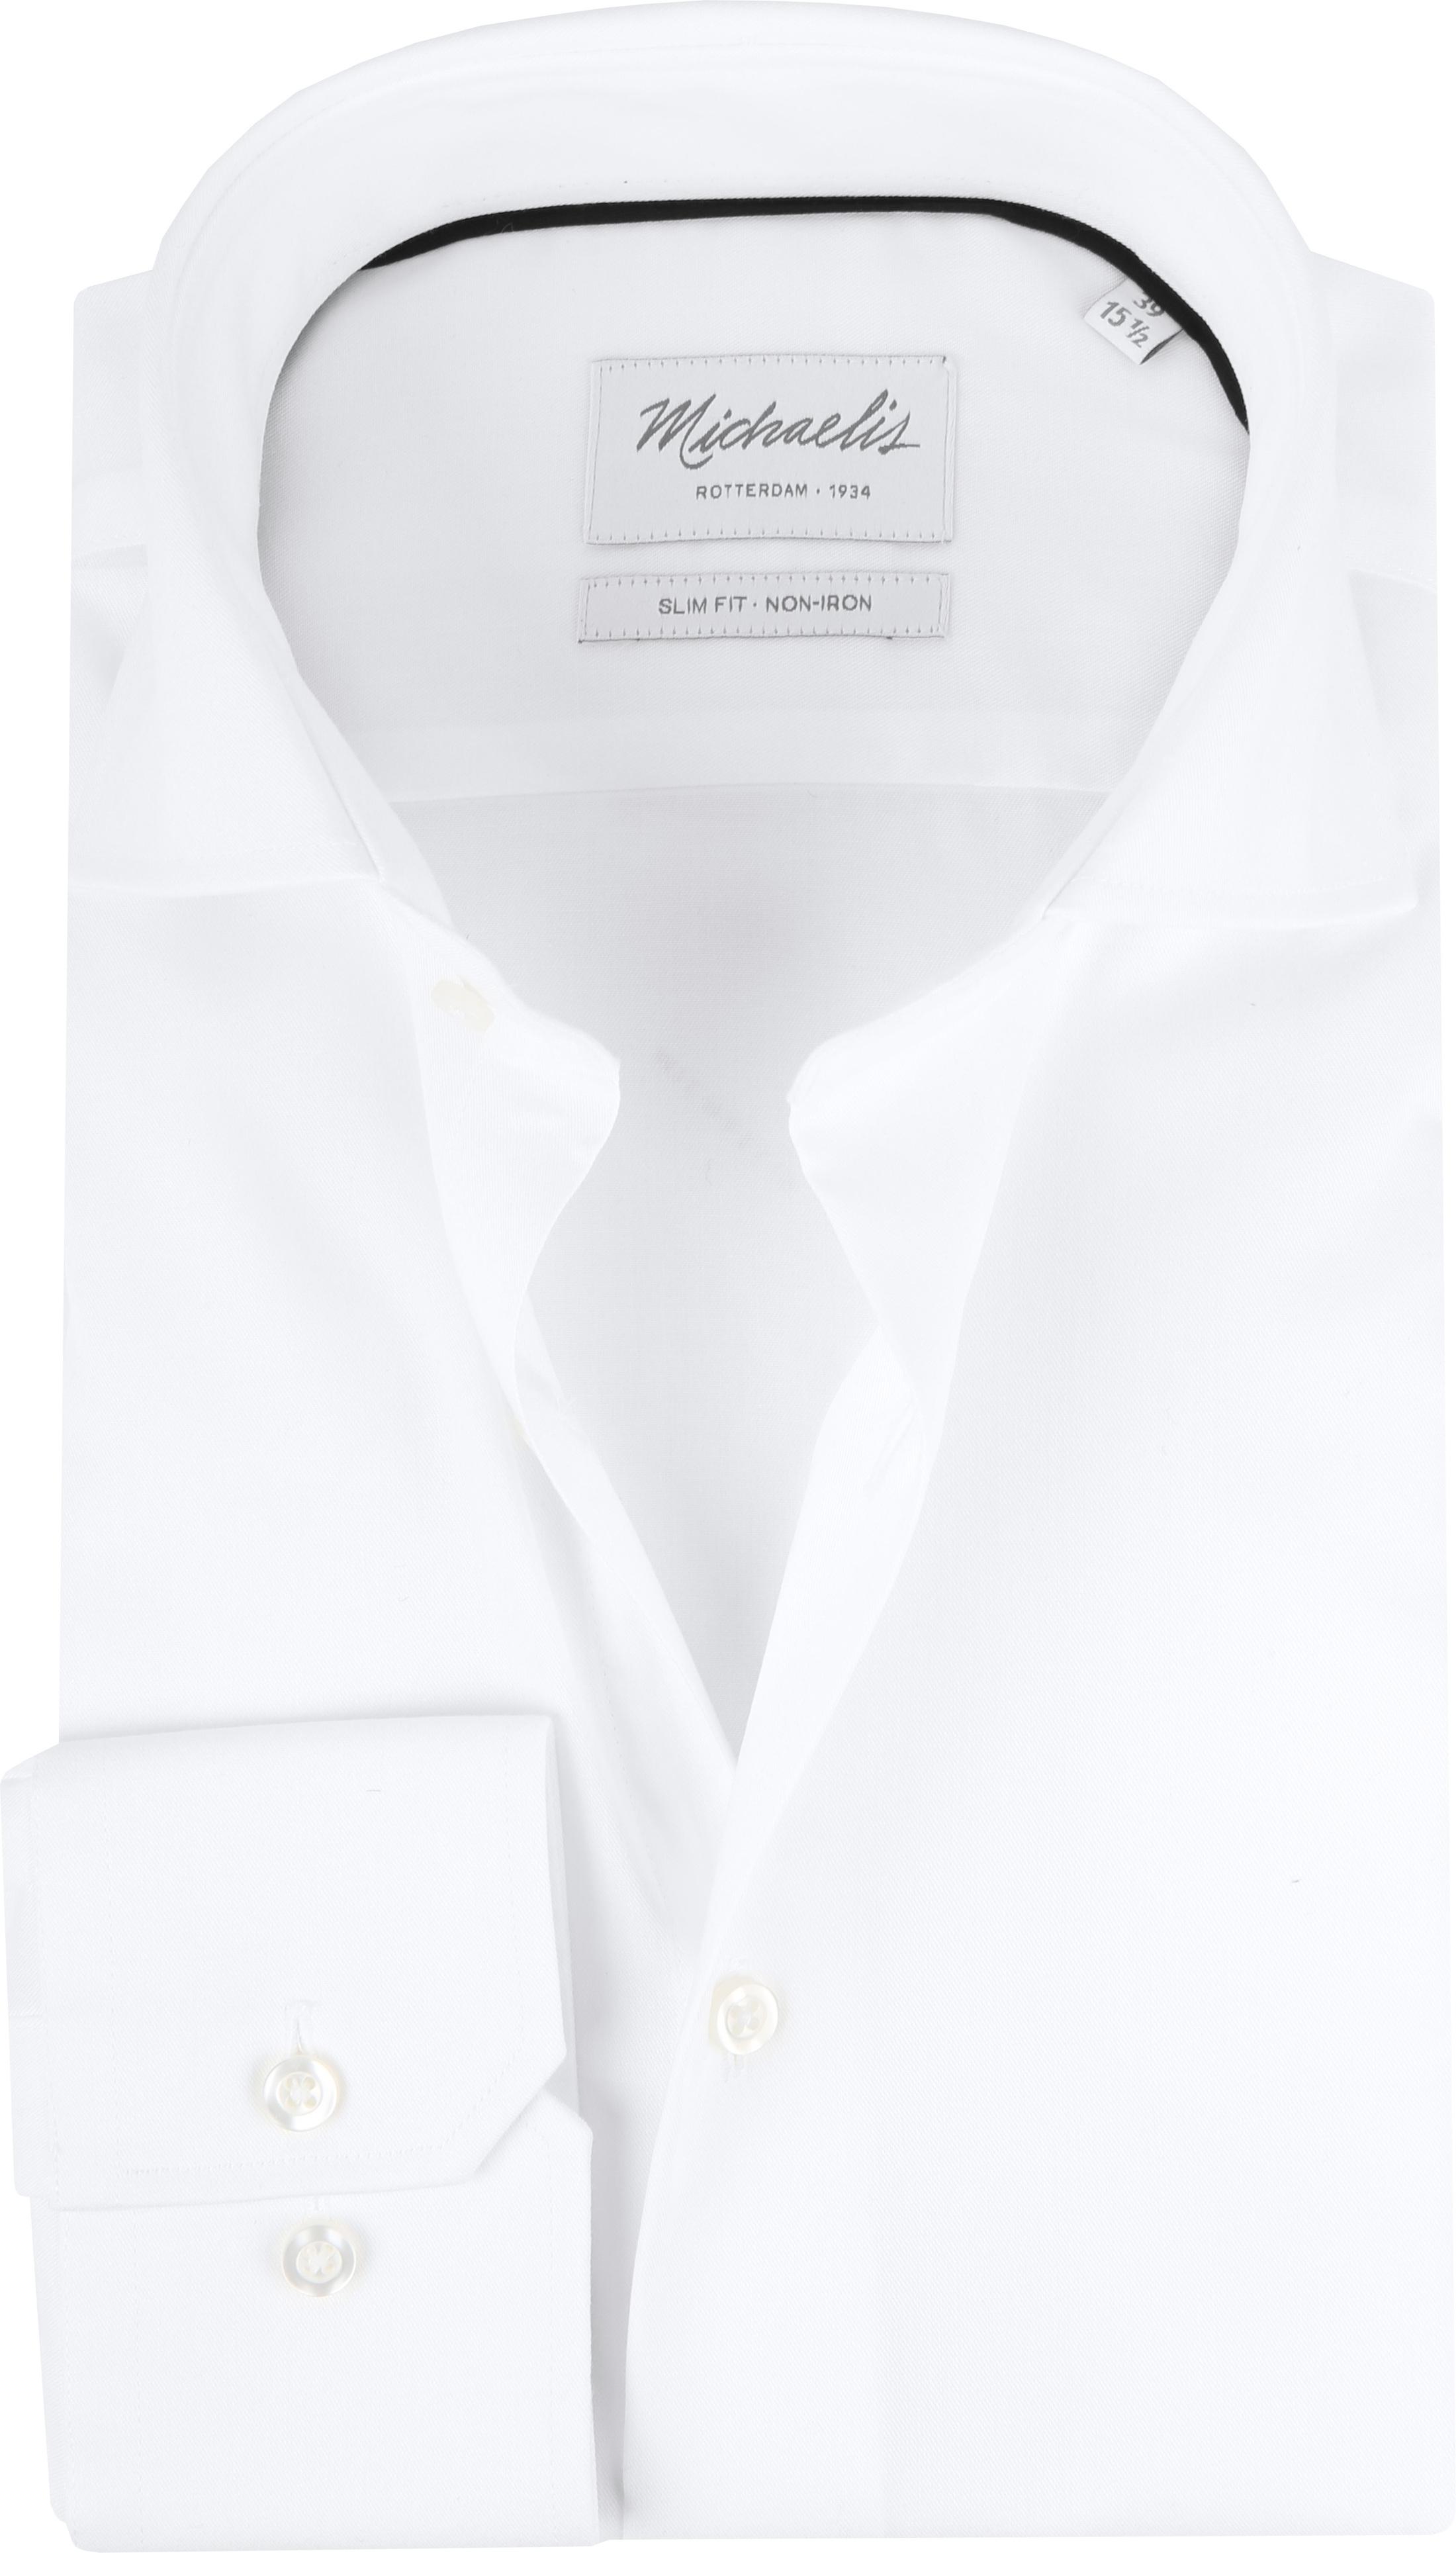 Slim Fit Wit Overhemd.Michaelis Overhemd Slim Fit Wit Pm0h000009